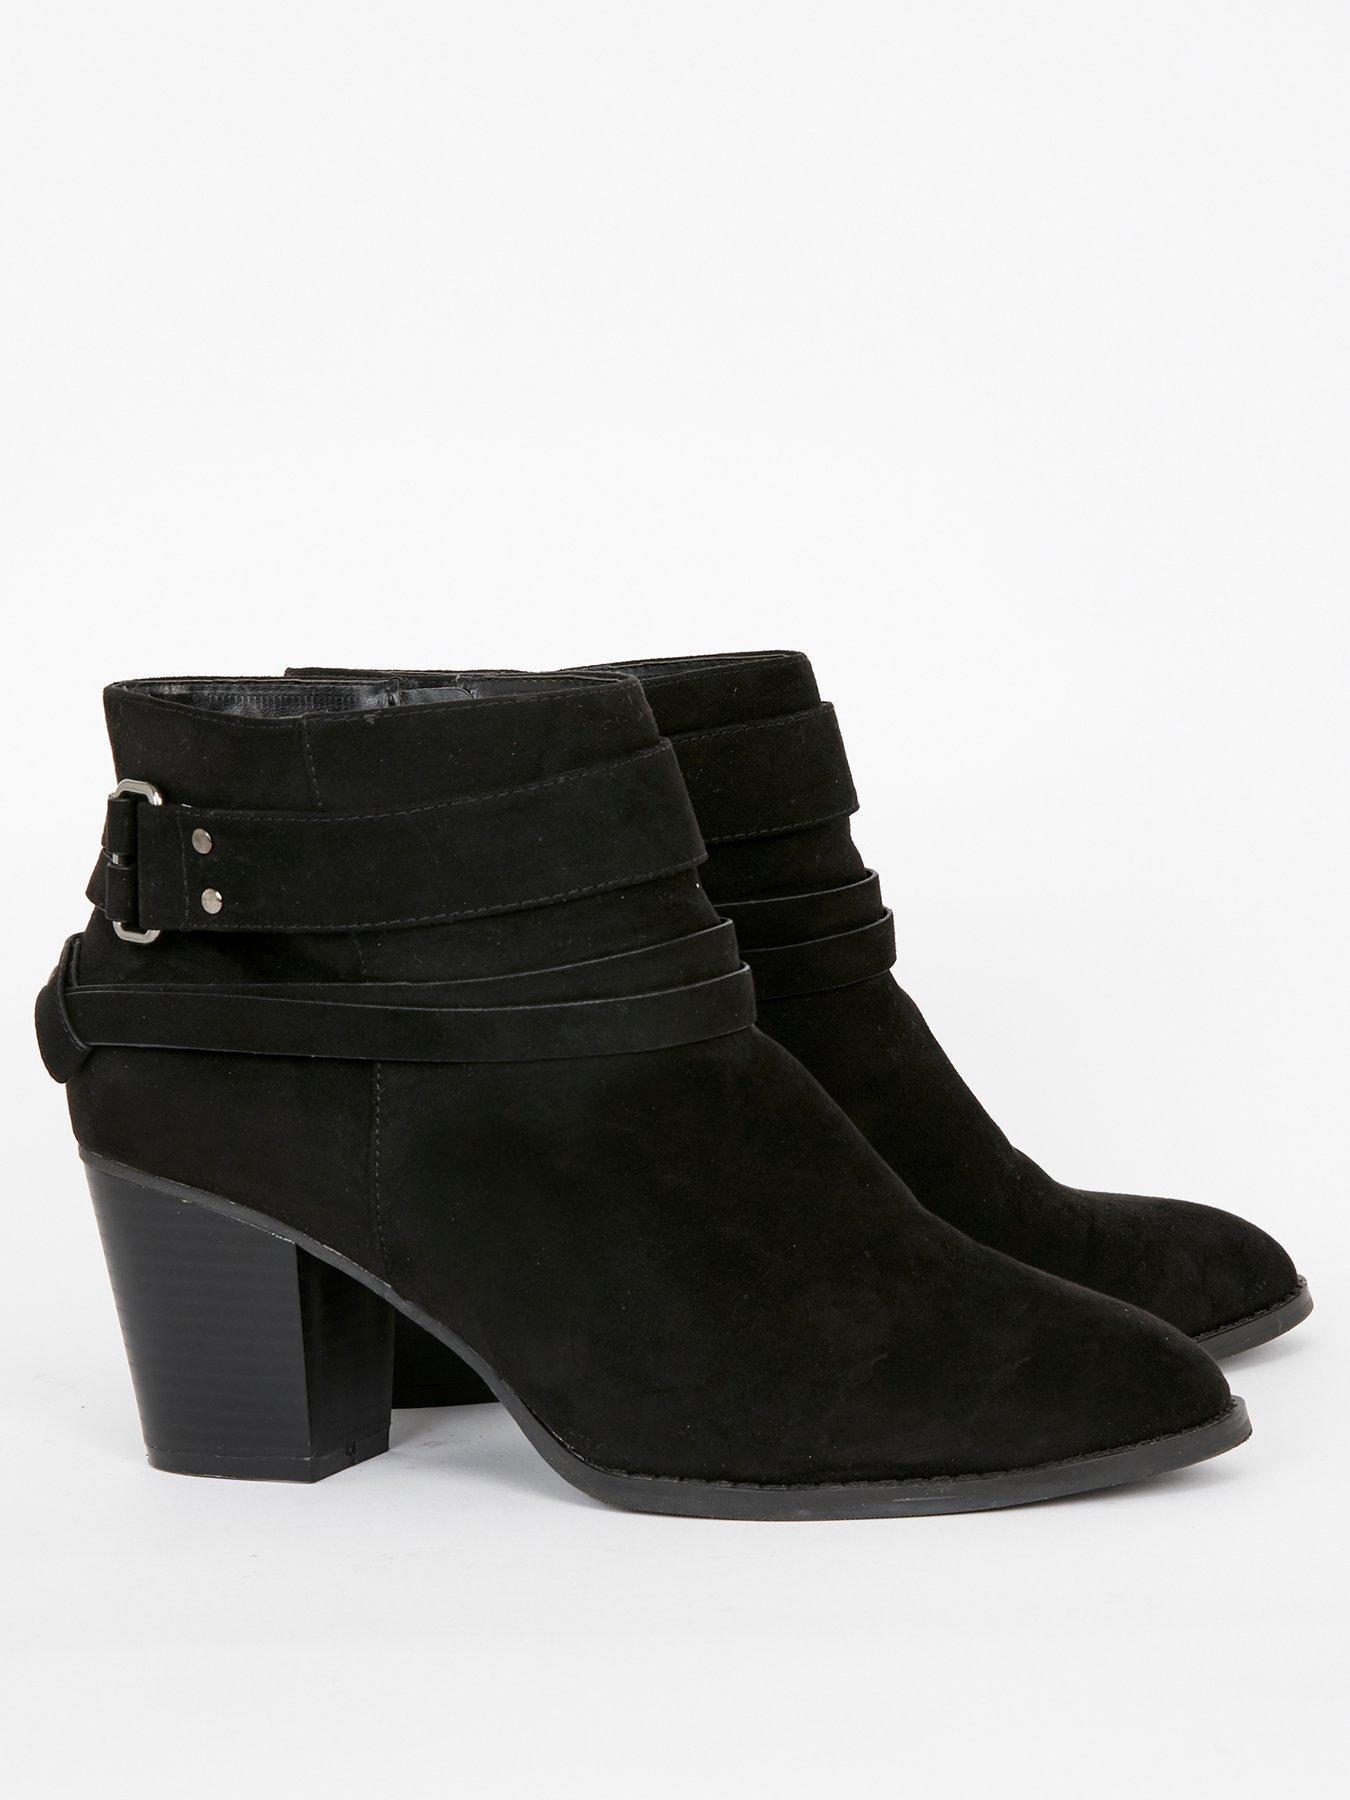 evans shoes on sale